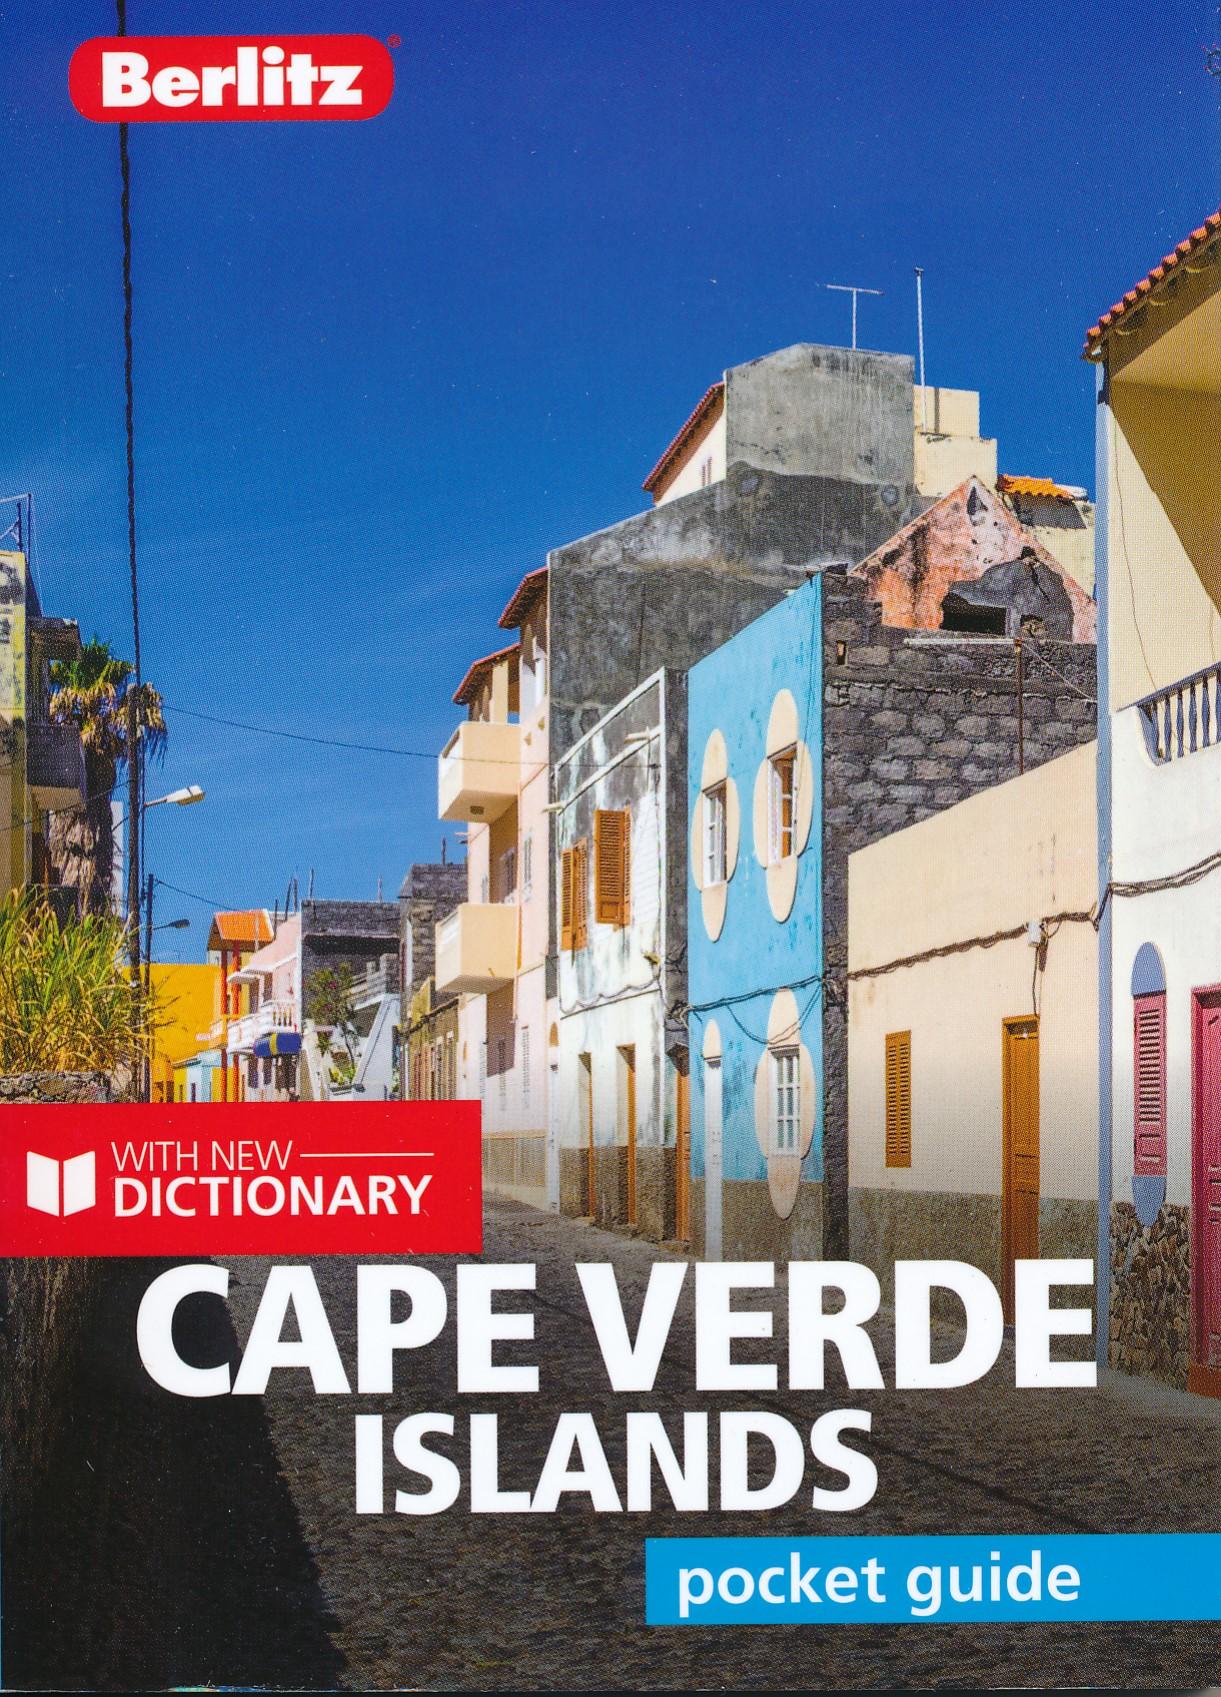 Reisgids Pocket Guide Cape Verde Islands - Kaapverdische Eilanden   Berlitz